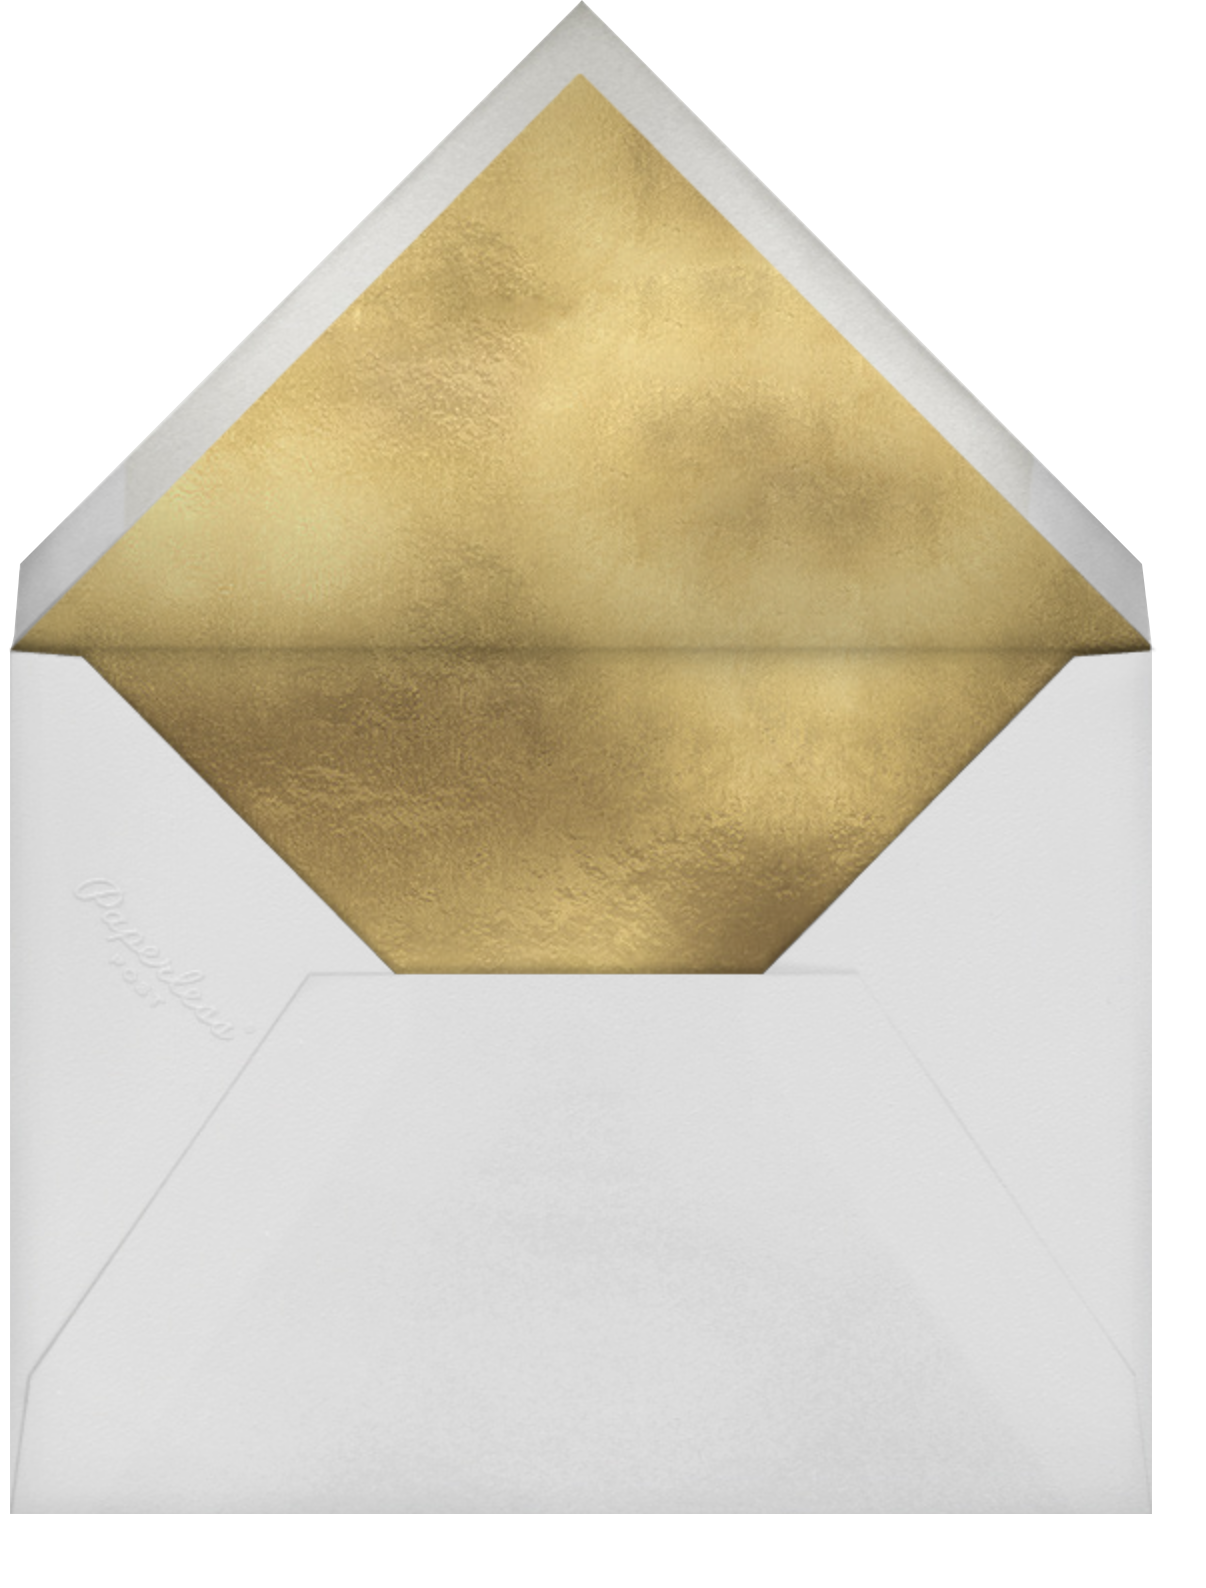 Avalon - Macaron - Kelly Wearstler - Business holiday cards - envelope back